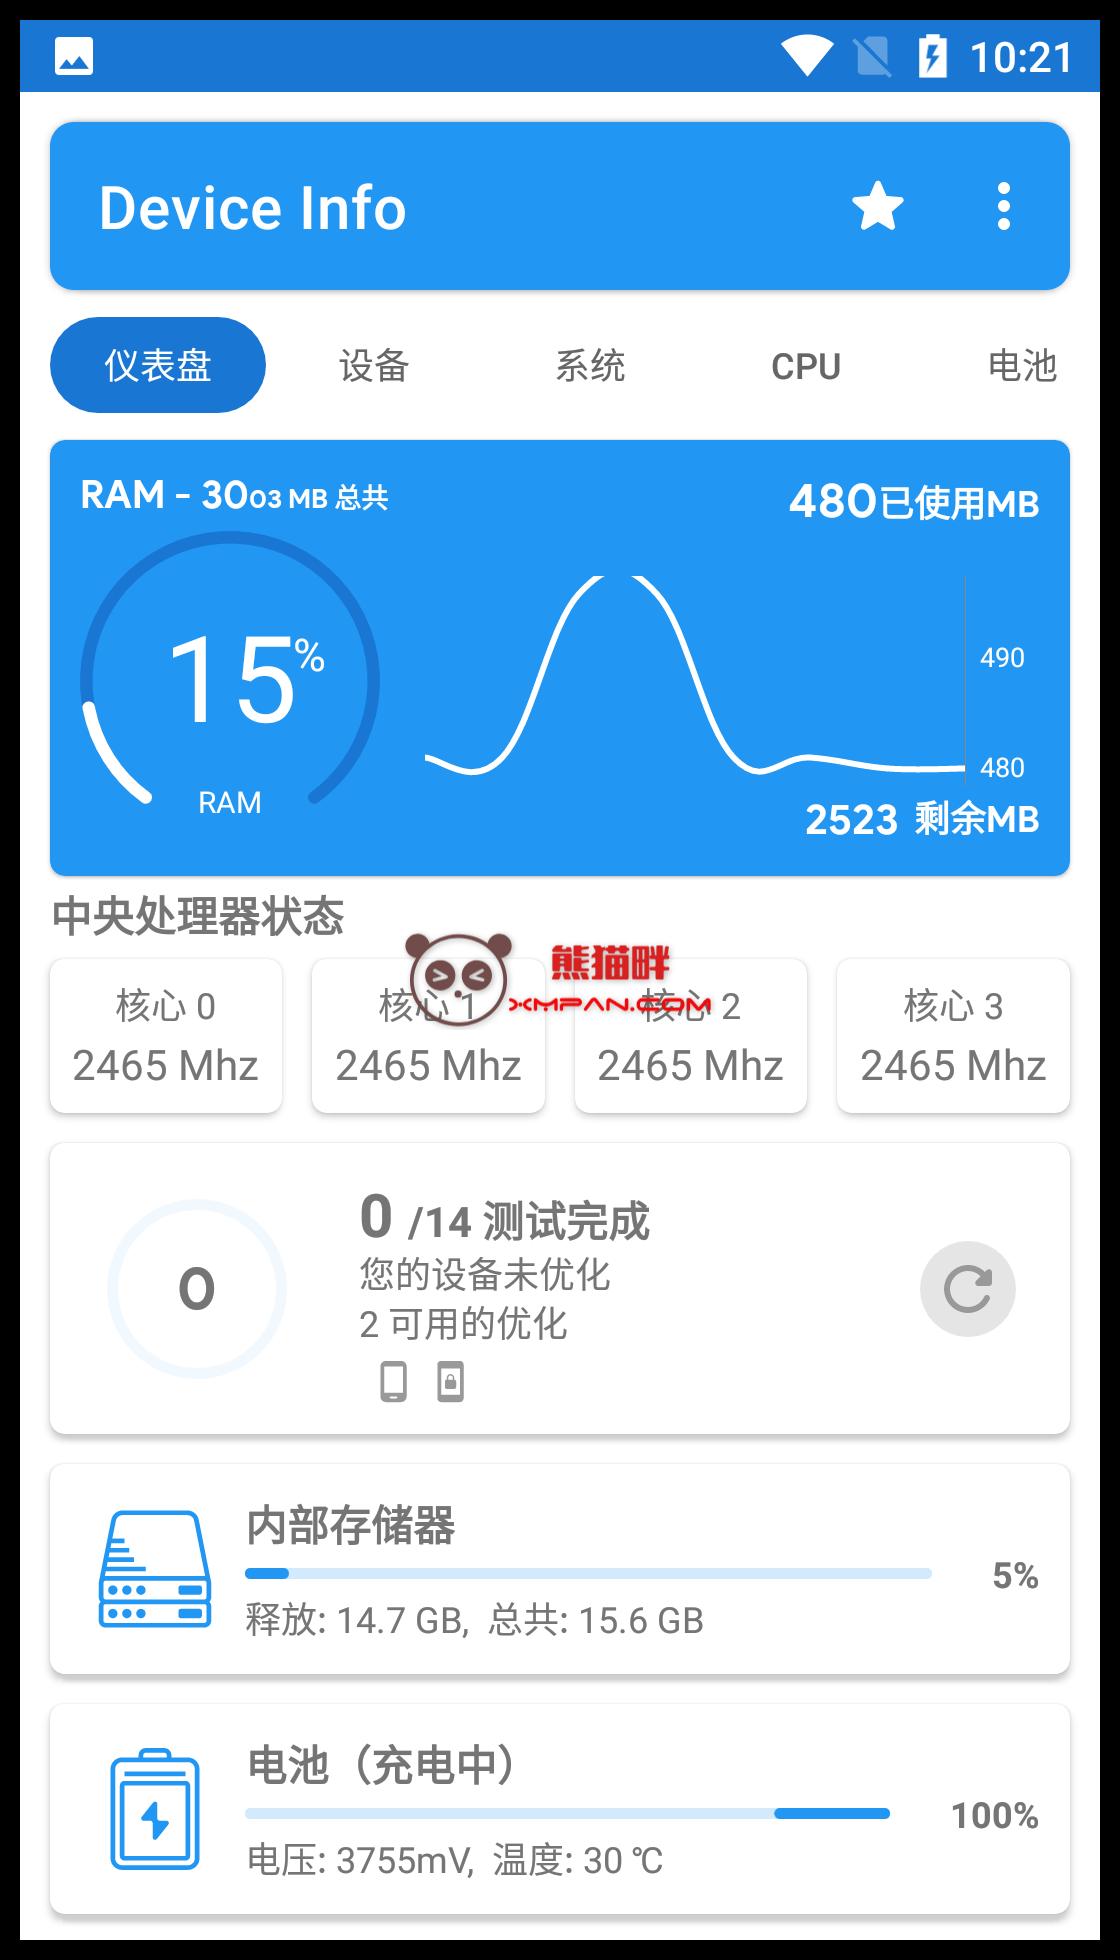 Android 查看测试Device Info设备信息 v3.2.6 build 112 高级版